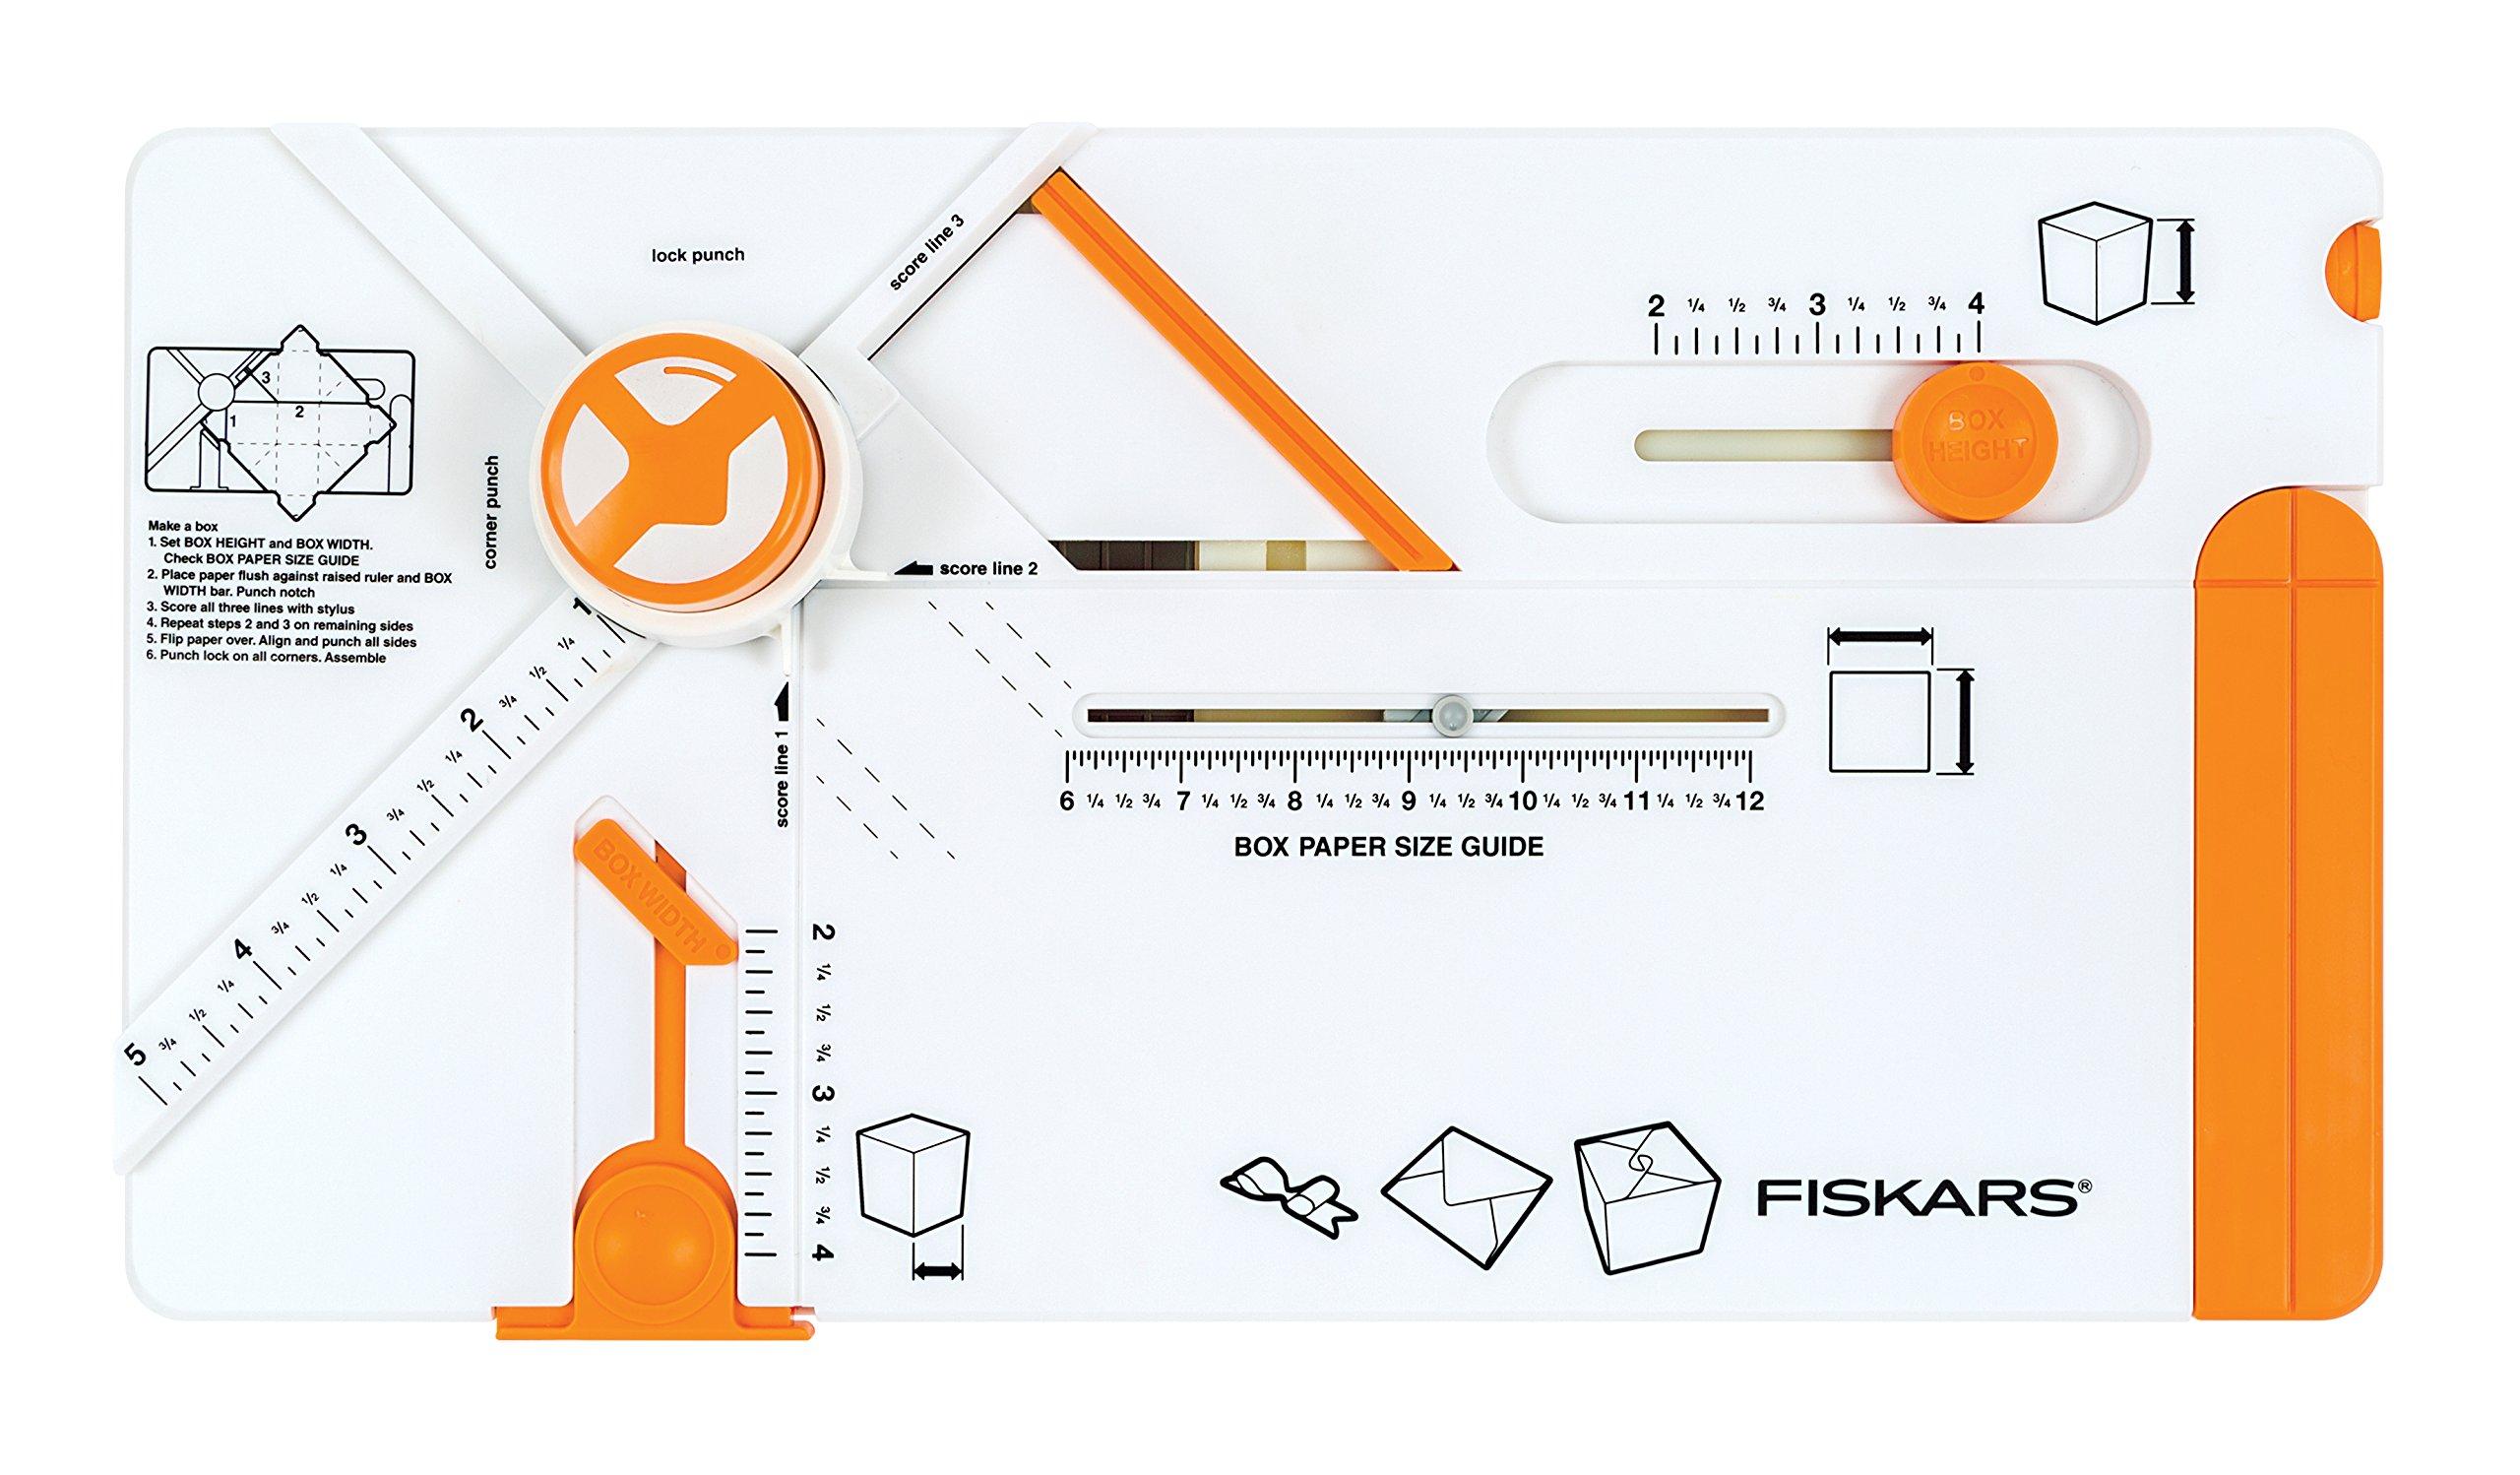 Fiskars 119310-1002 Gifting Board Box Scoring Maker, Orange/White